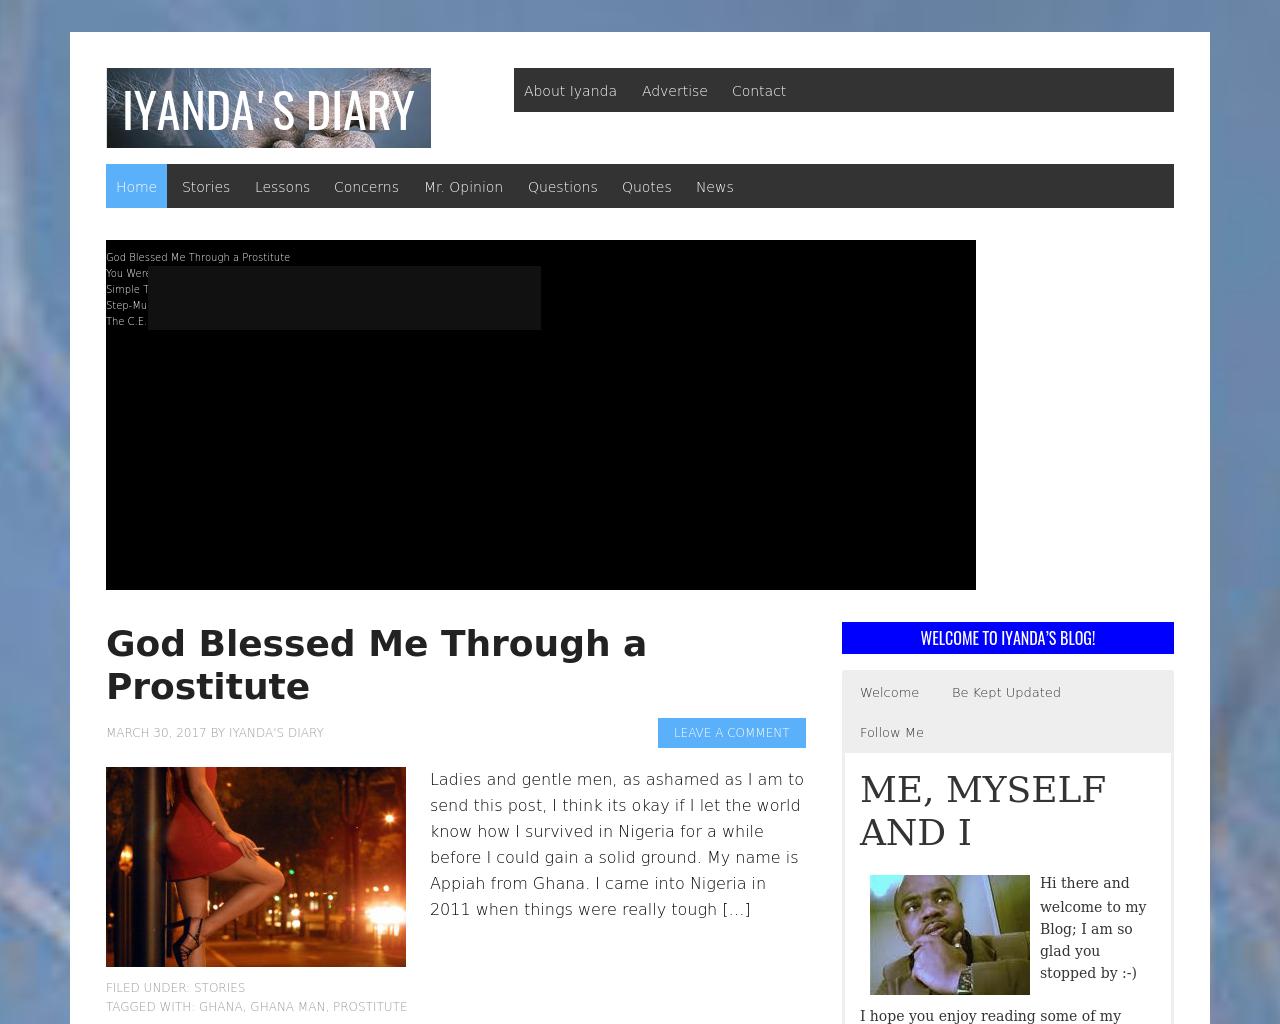 Iyanda's-Diary-Advertising-Reviews-Pricing